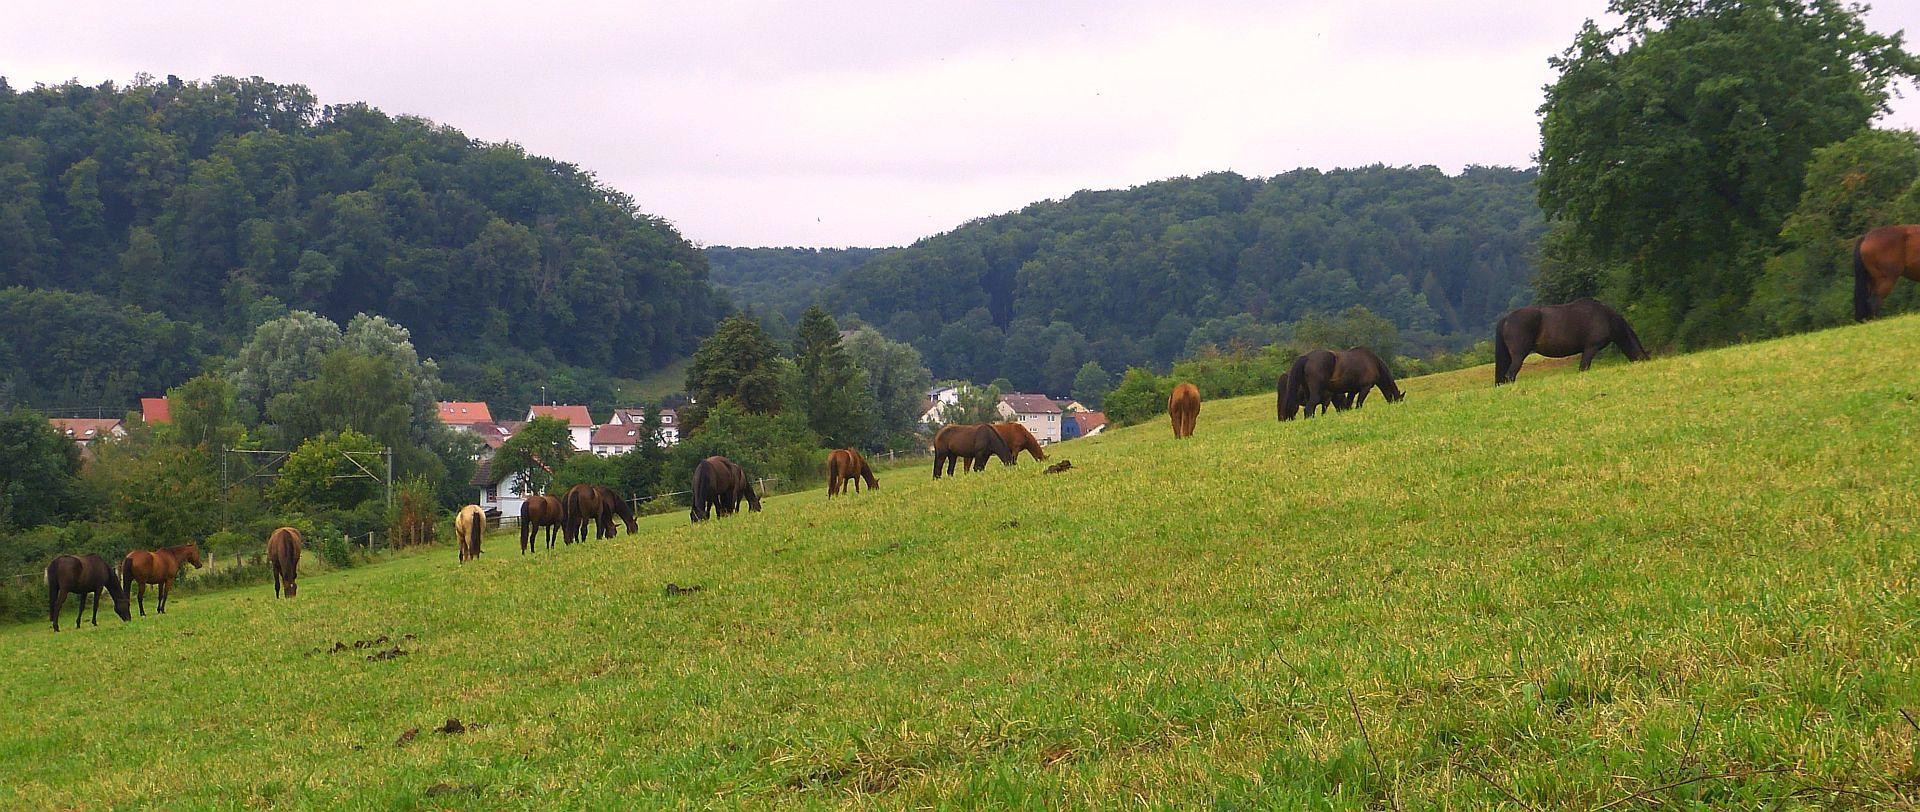 Die große Pferdeweide am Ortsrand von Urspring